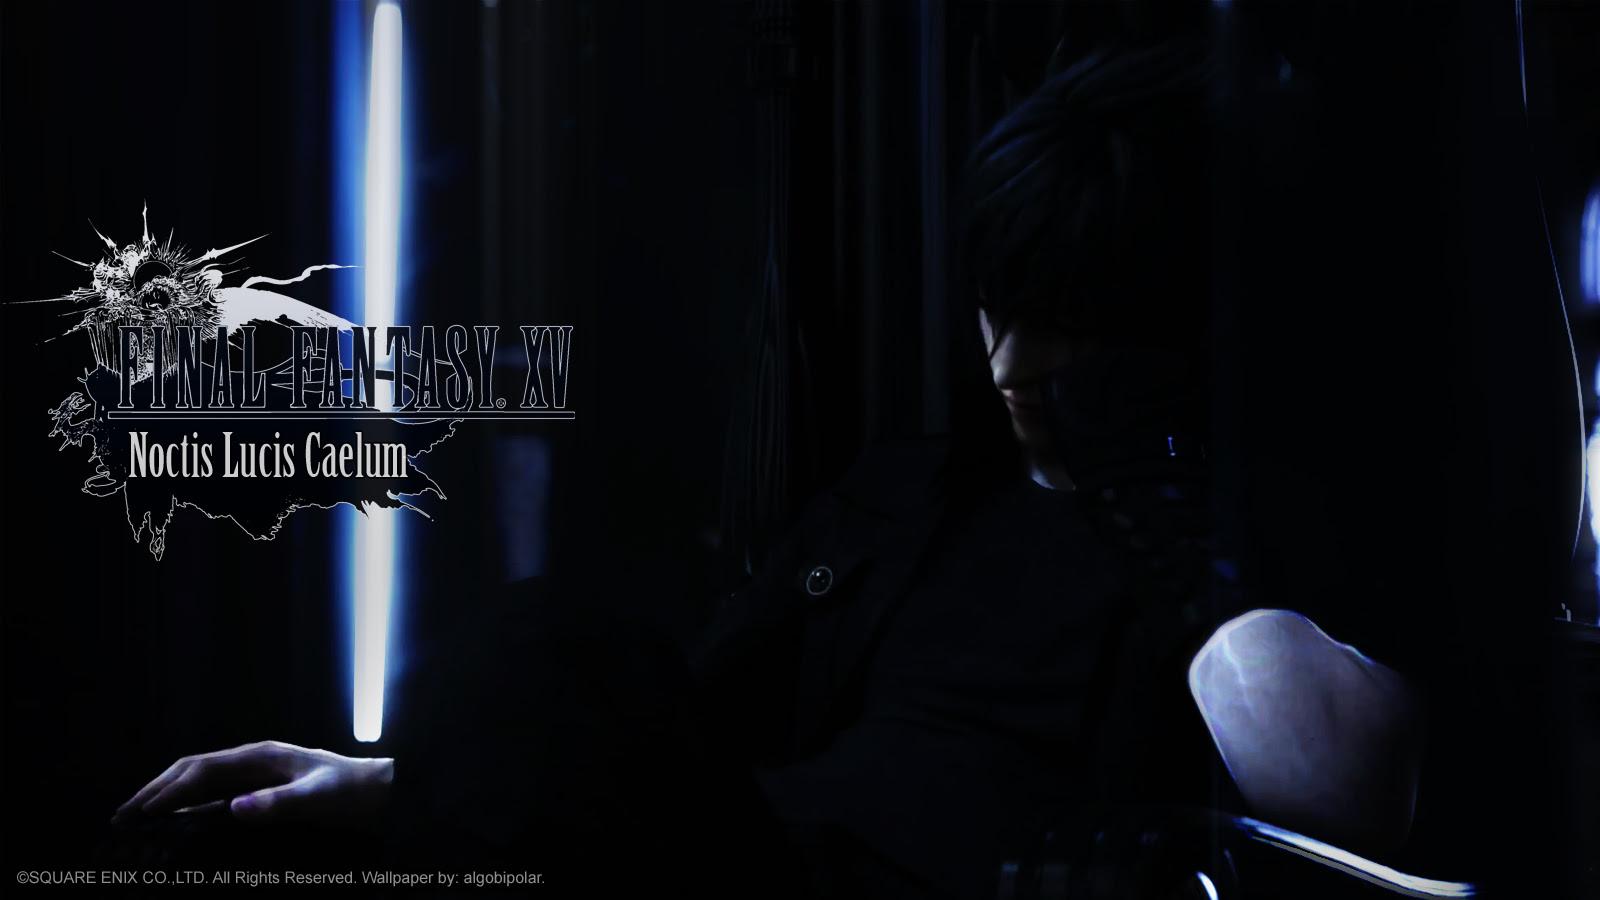 Final Fantasy Xv Wallpaper A Noctis Wall He S Thinking Minitokyo